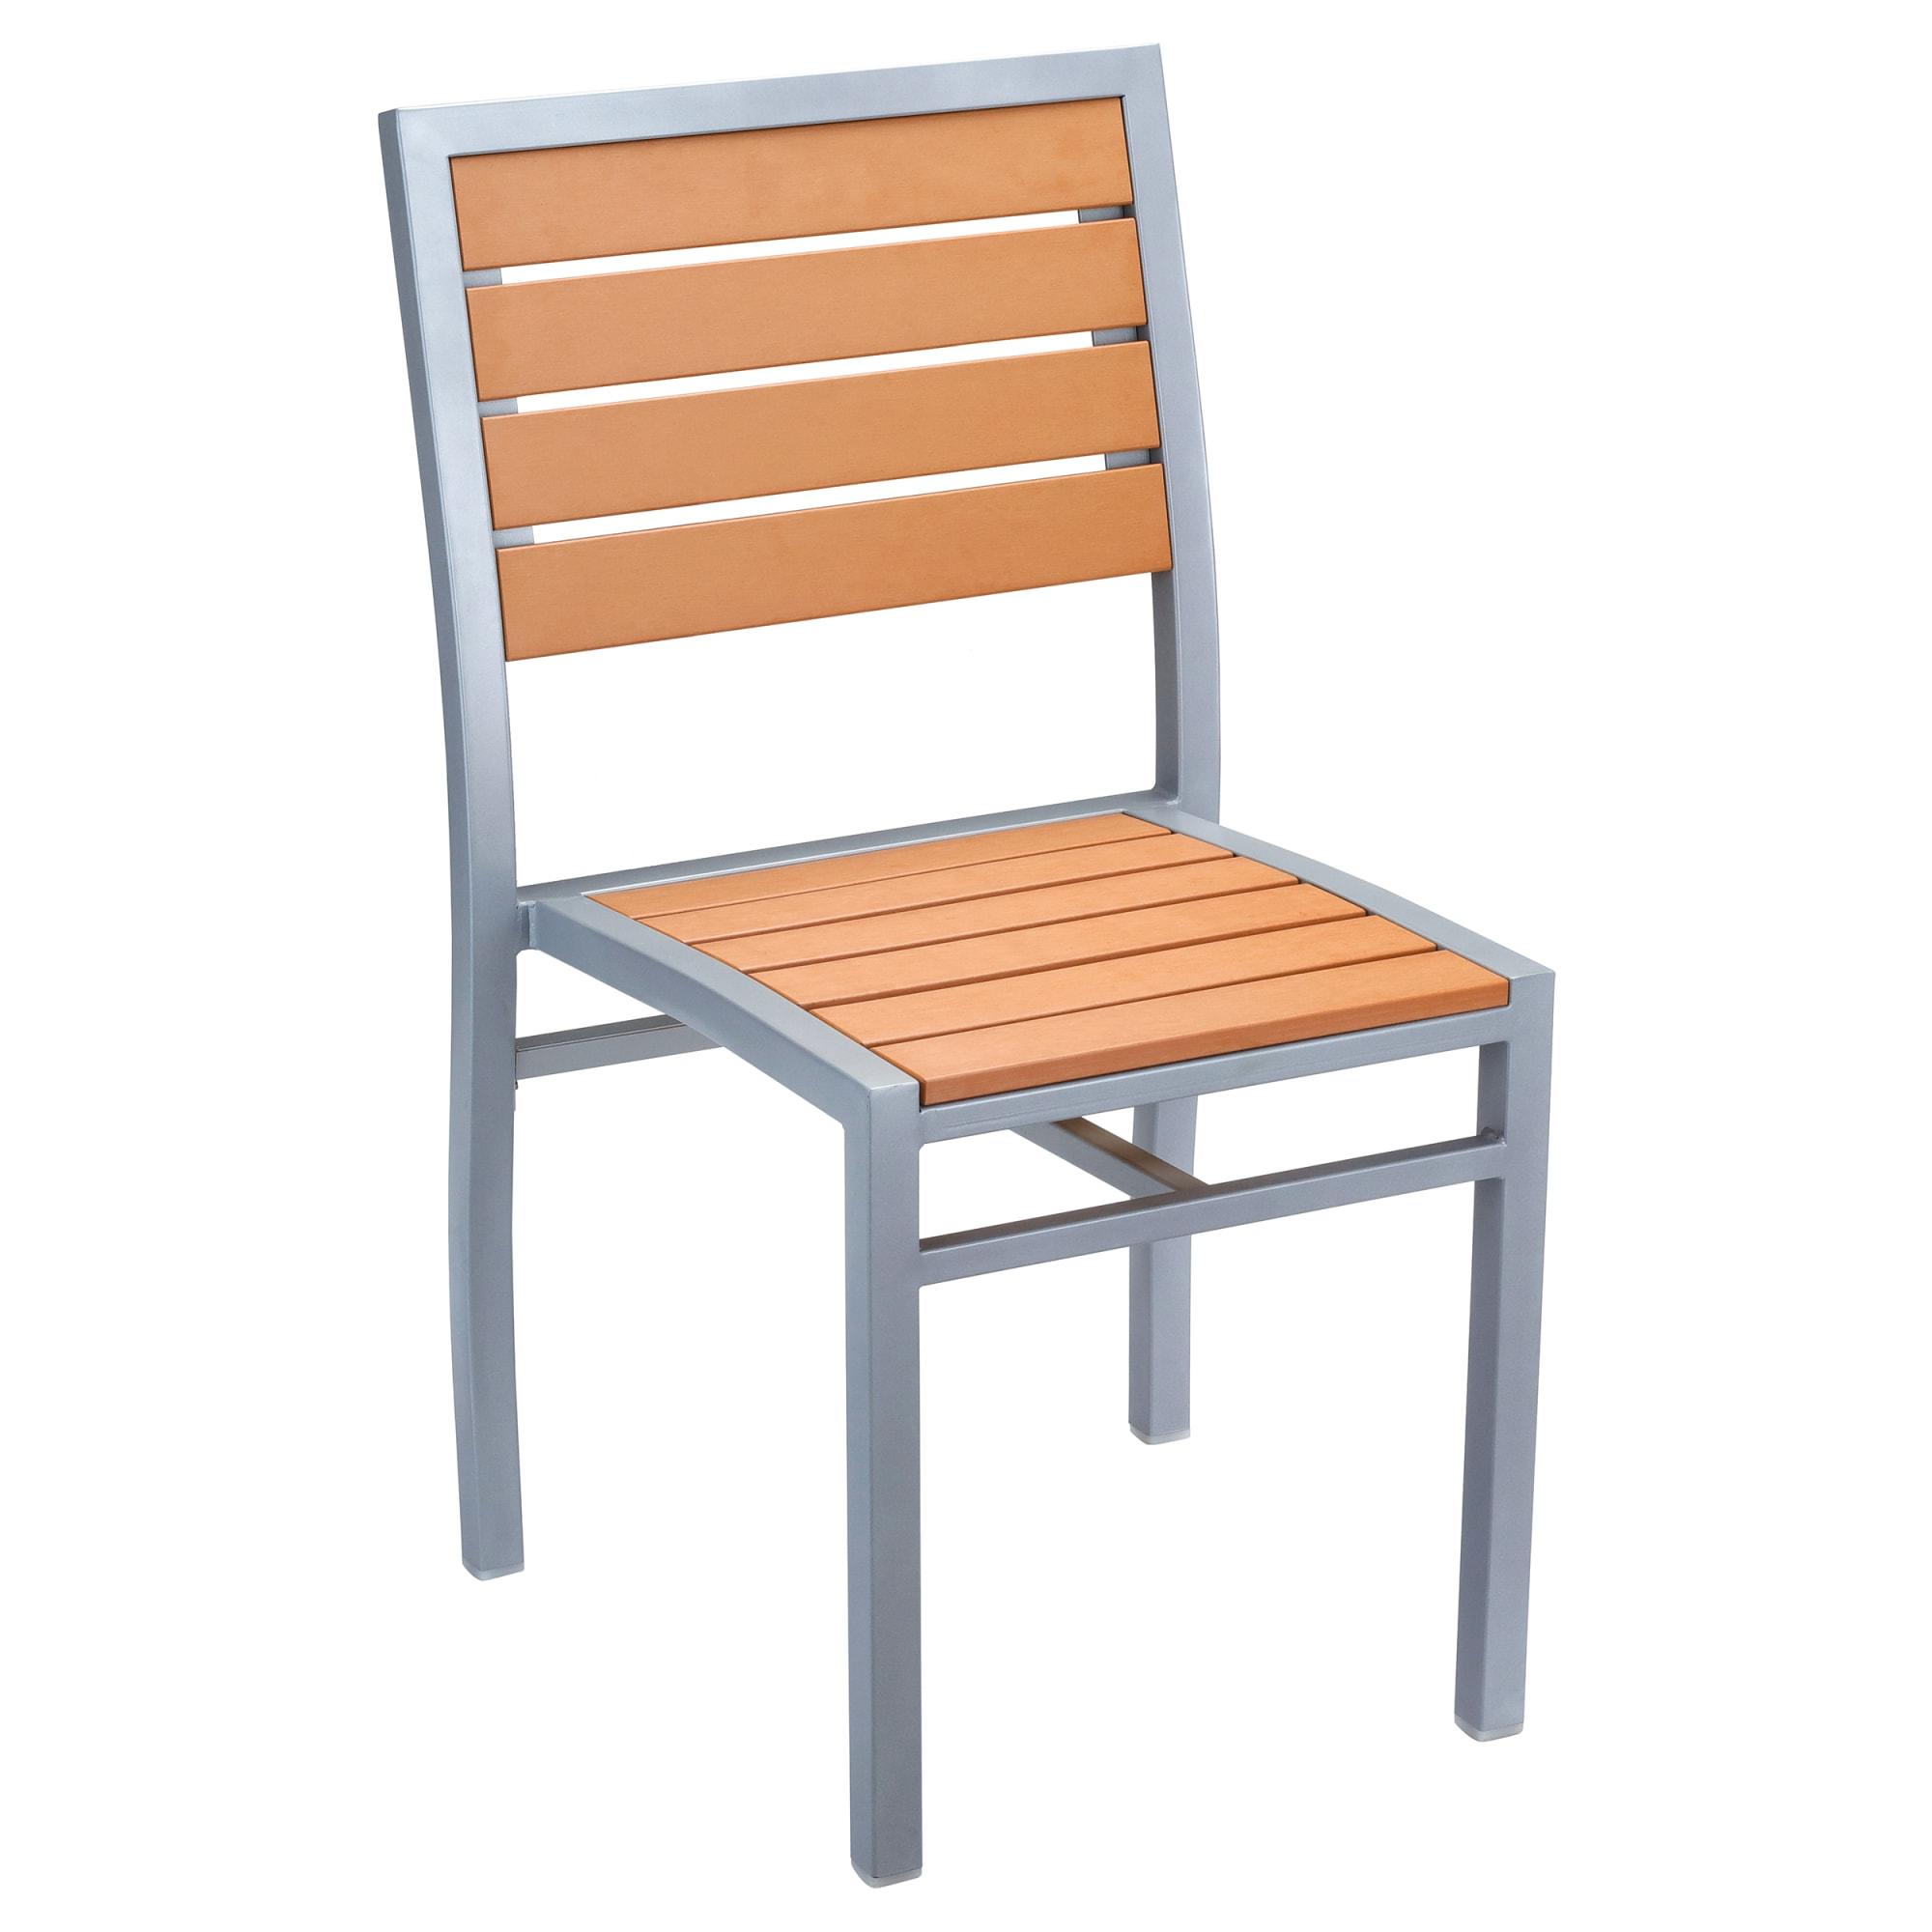 Grey Finish Heavy Duty Patio Chair with Plastic Teak with Grey Finish Heavy Duty Patio Chair with Plastic Teak